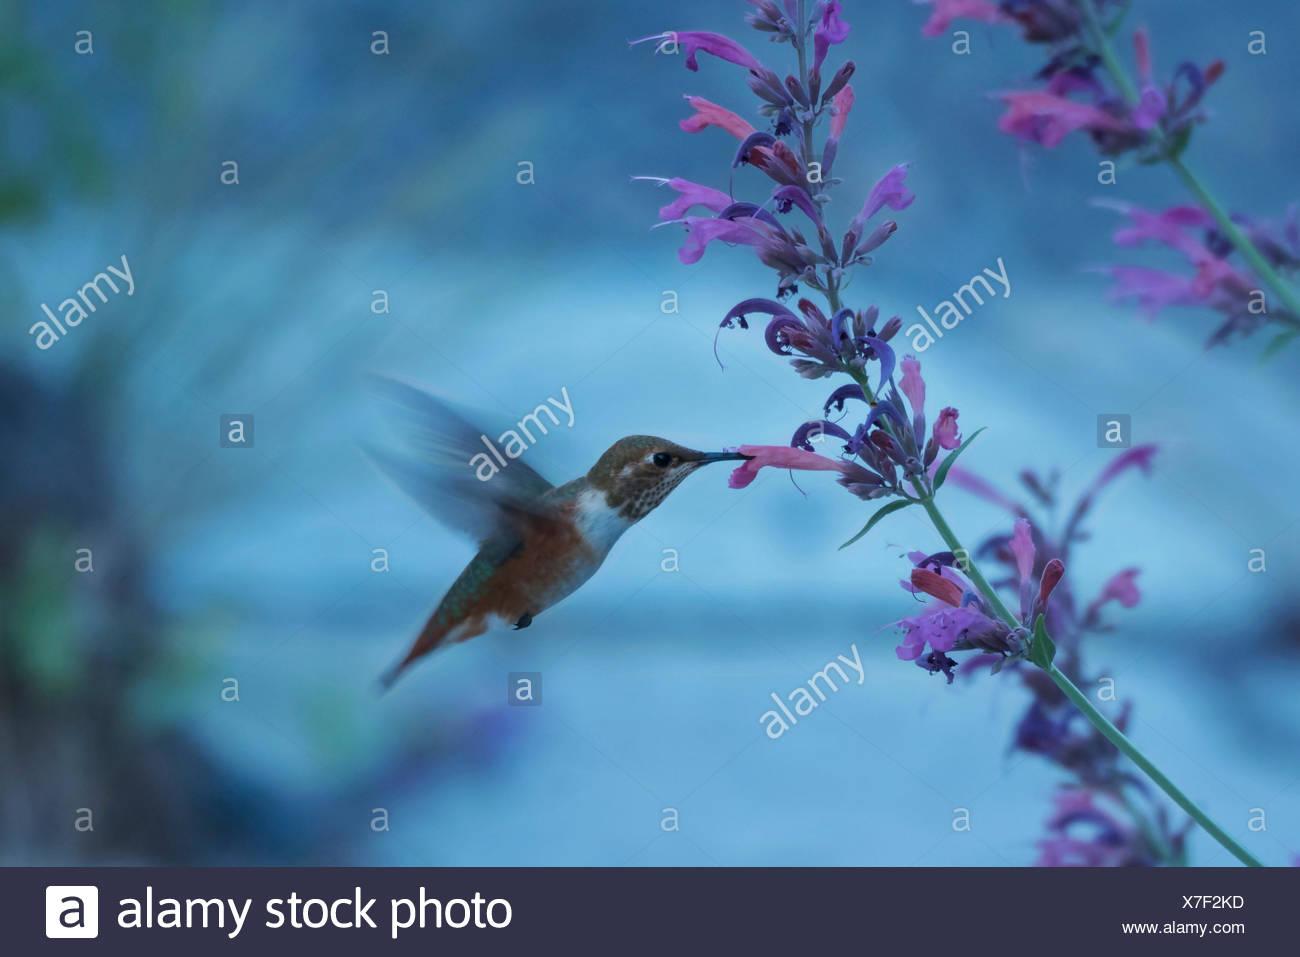 Oregon, Deschutes County, Bend, Hummingbird, - Stock Image